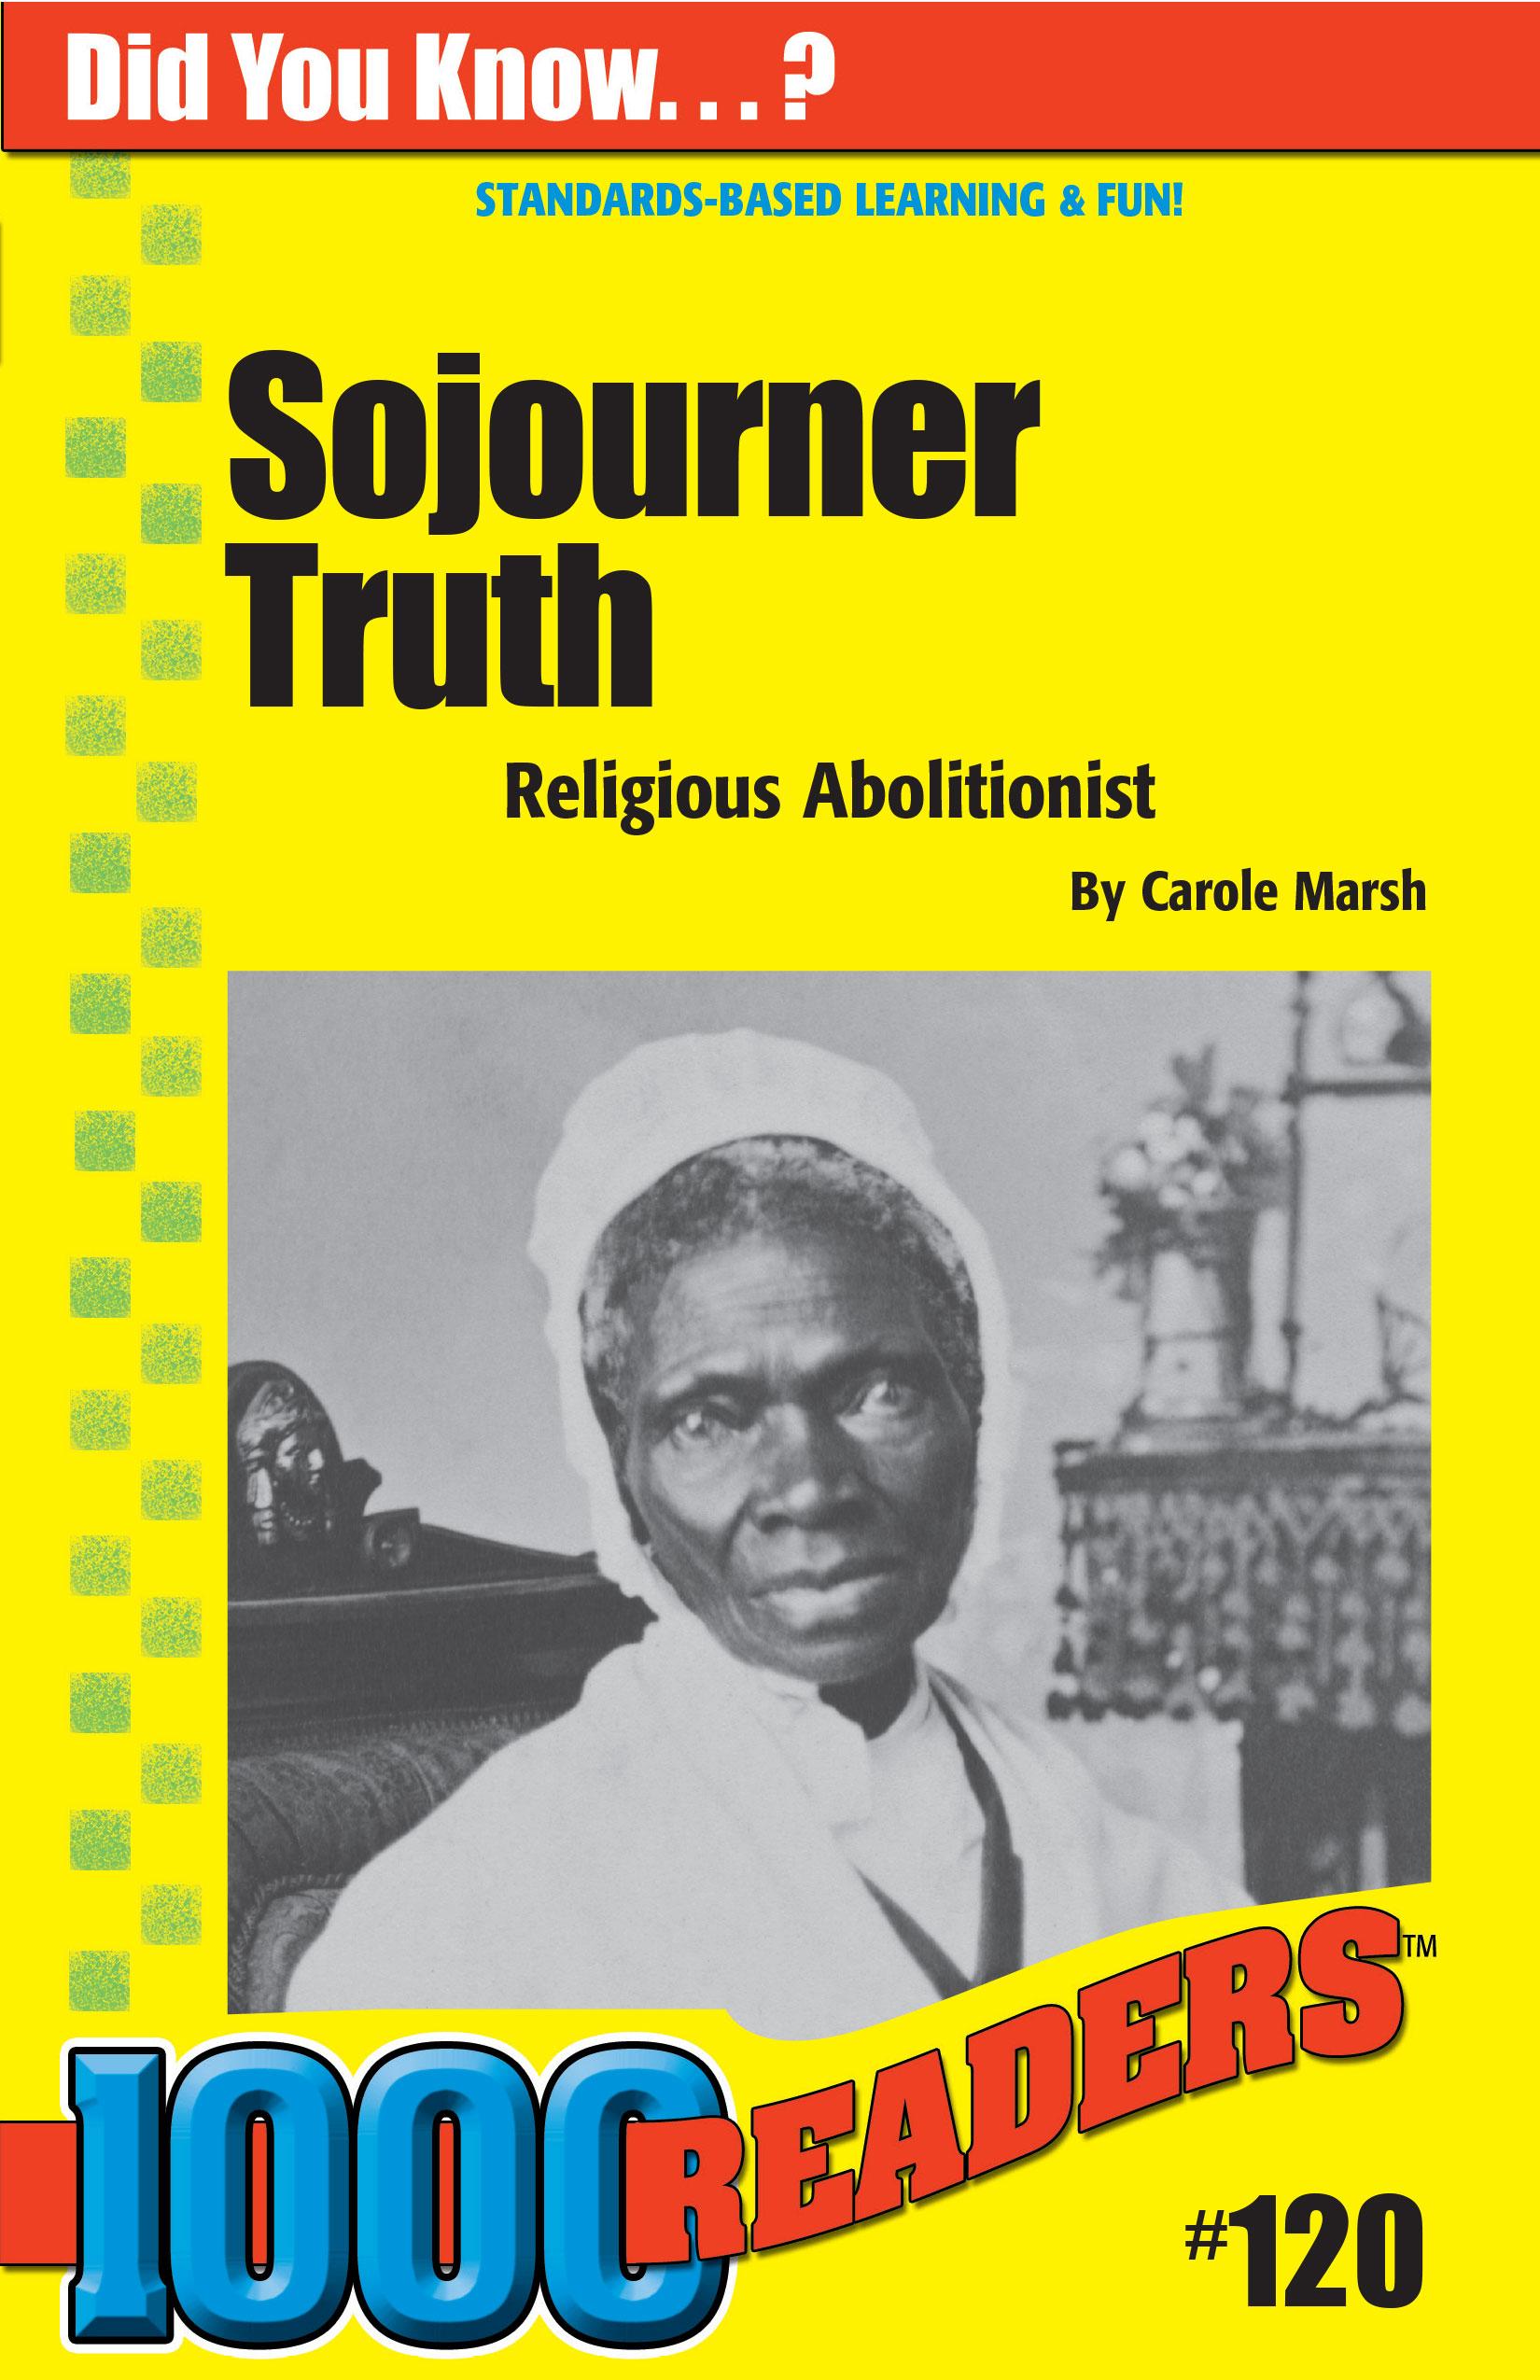 Sojourner Truth: Religious Abolitionist